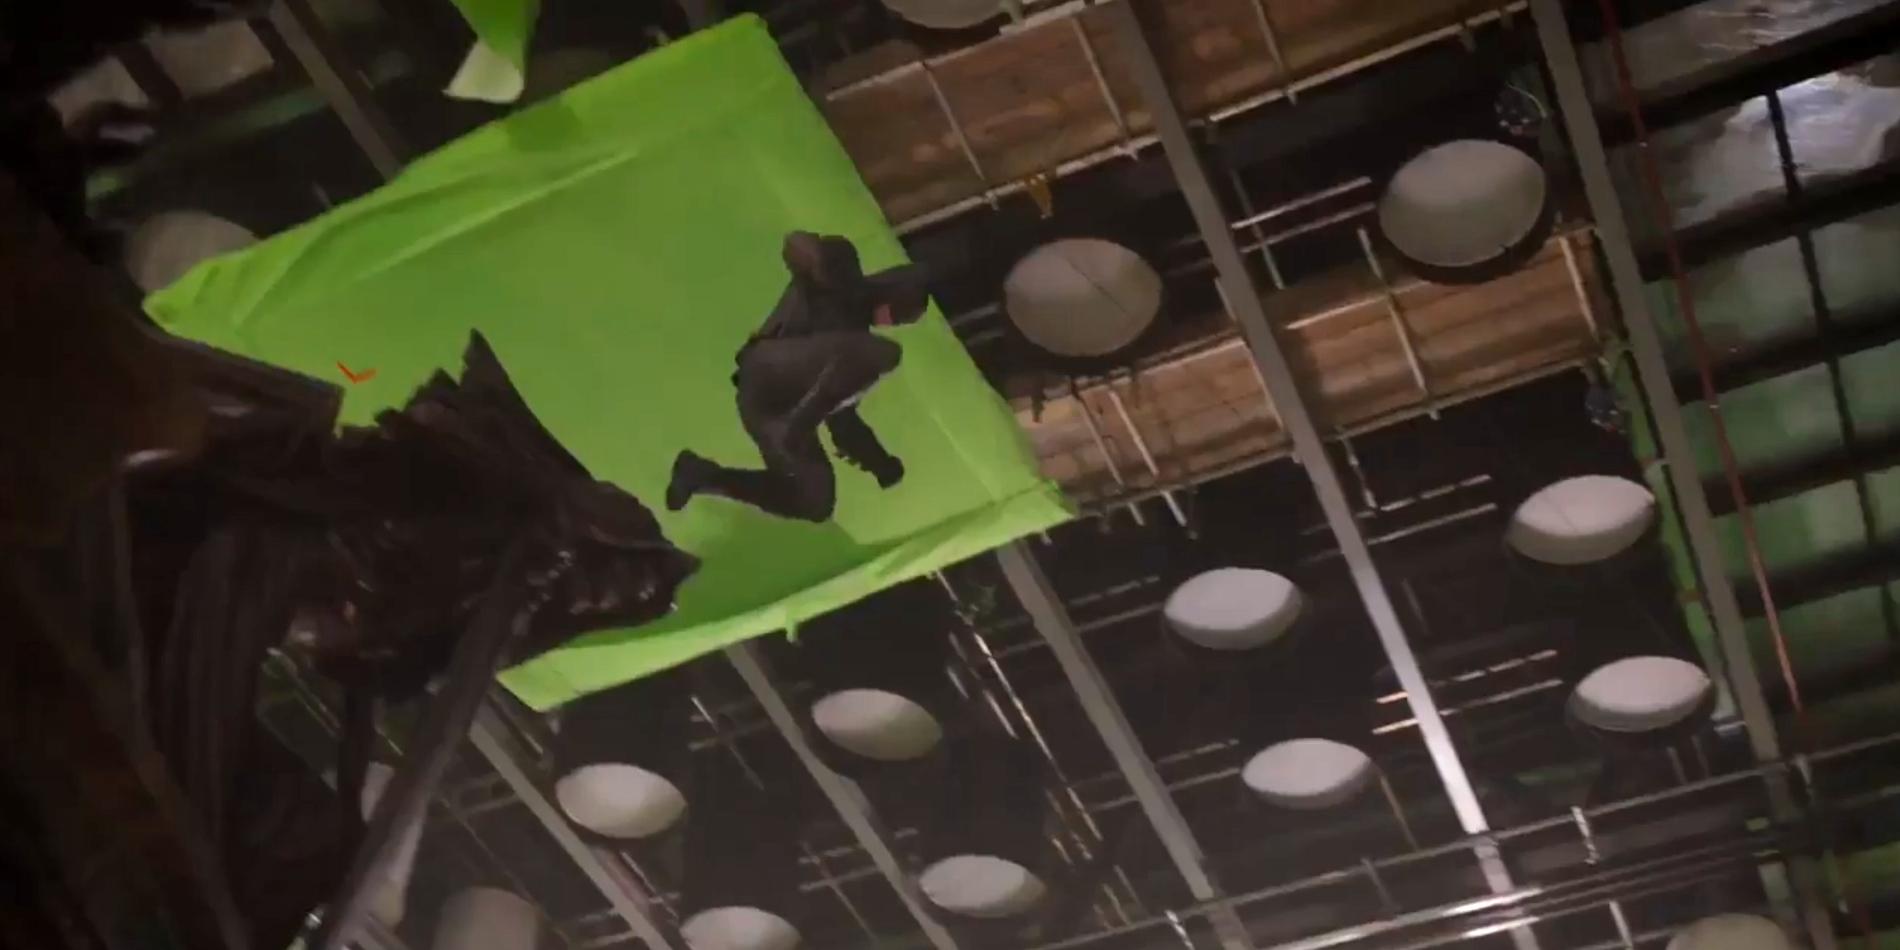 http://screenrant.com/wp-content/uploads/2016/10/Justice-League-Batman-Gargoyle.jpg